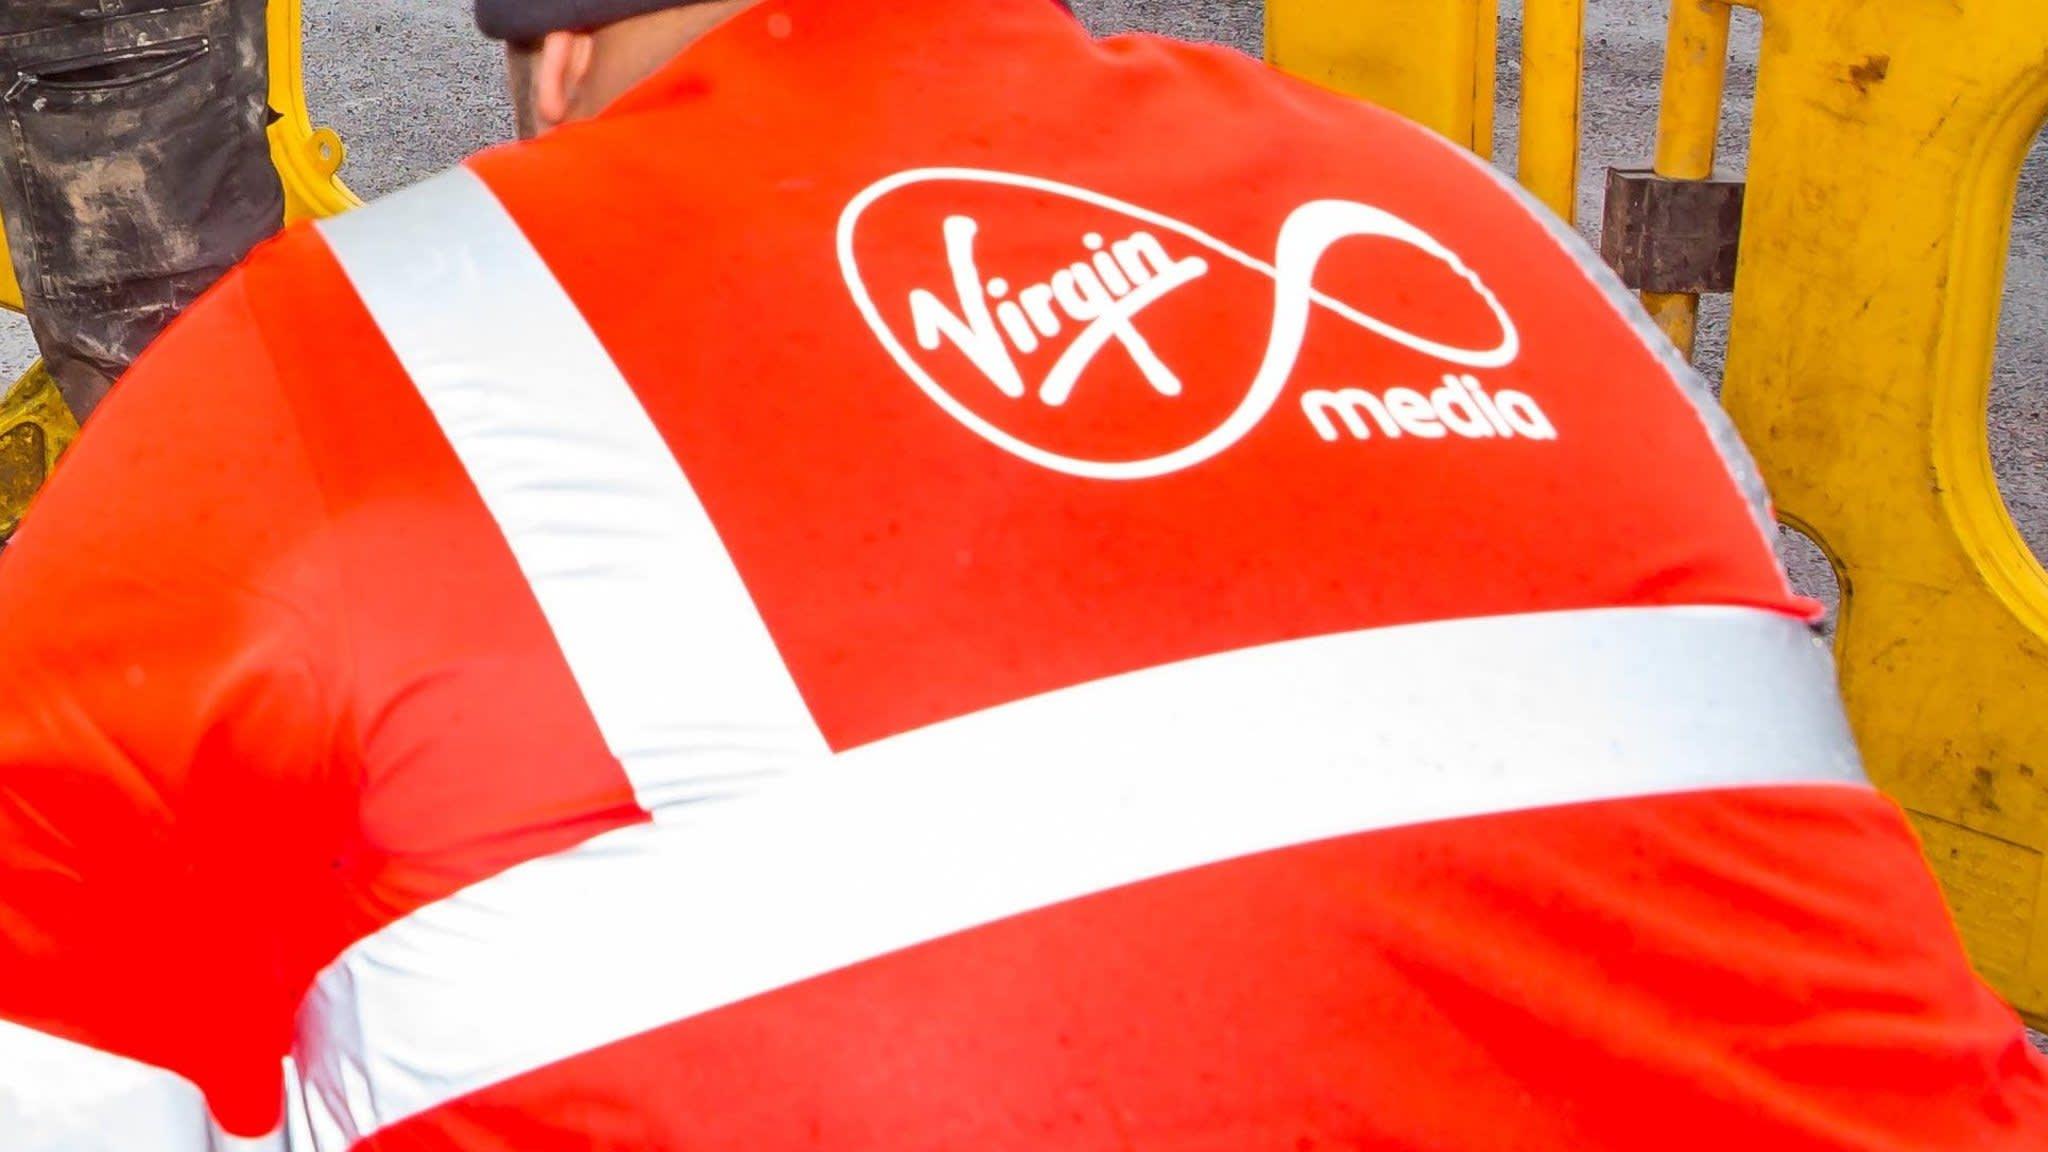 Virgin Media lined up for major high-speed fibre expansion